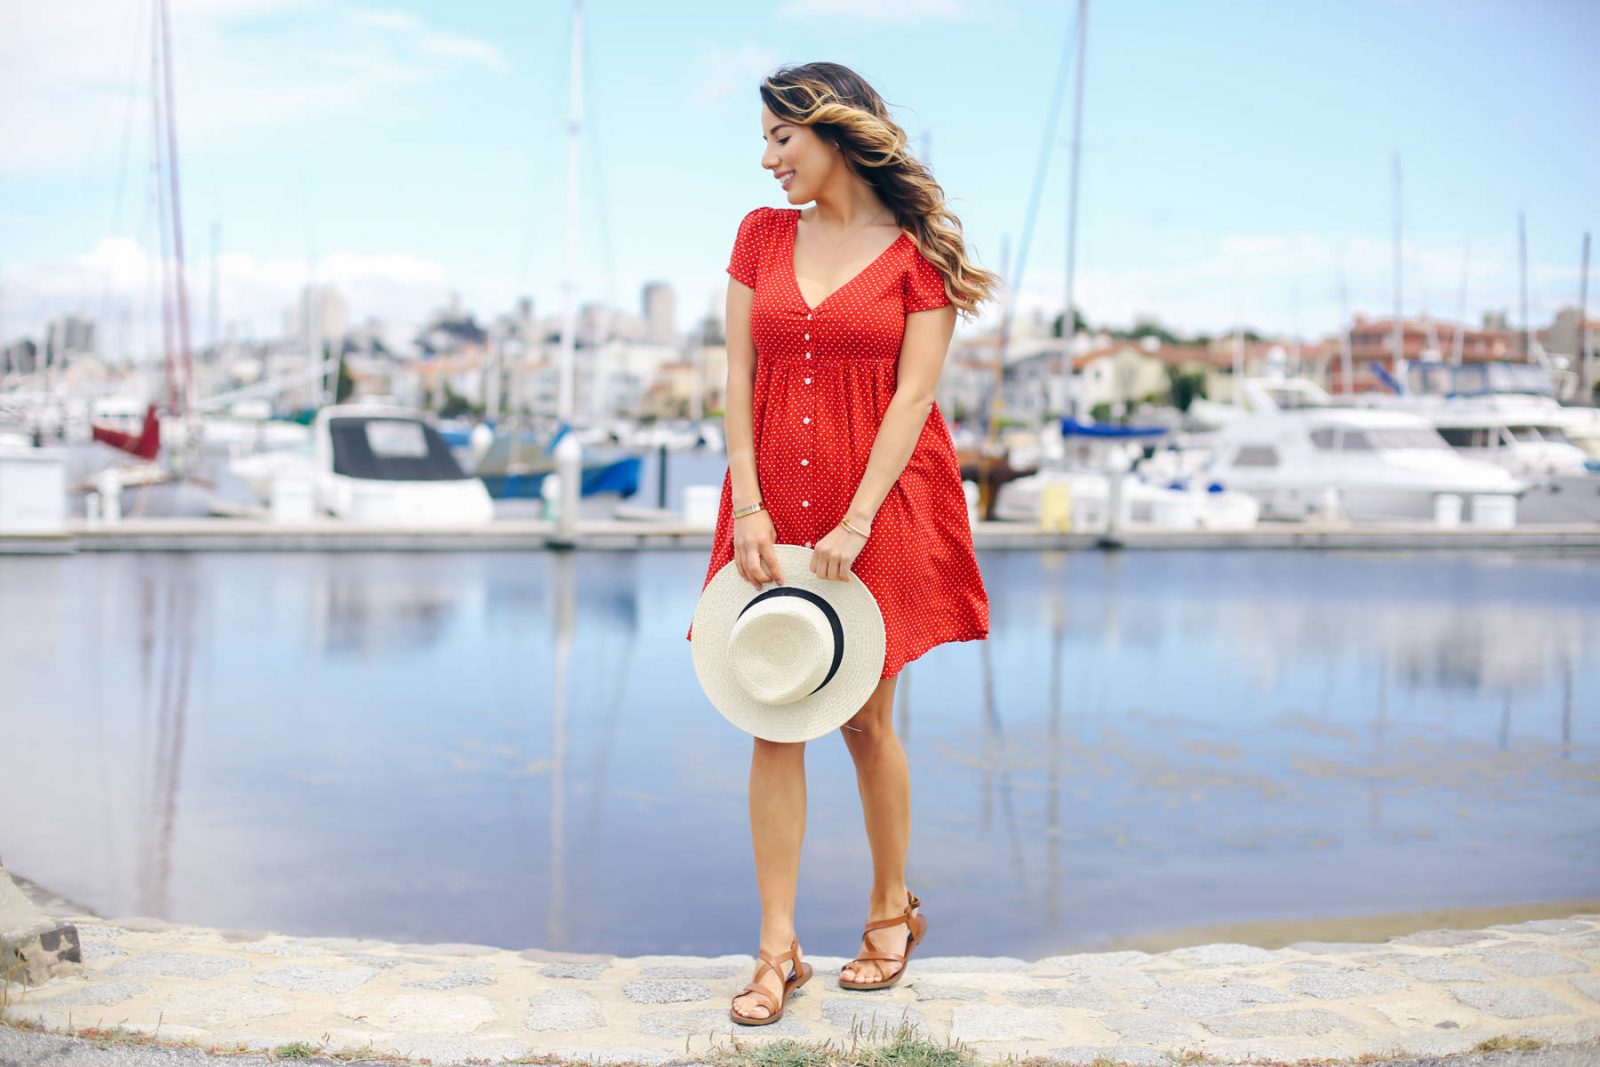 denim-jacket-red-dress-memorial-day-ariana-lauren-fashionborn-san-francisco-ryanbyryanchua-8660